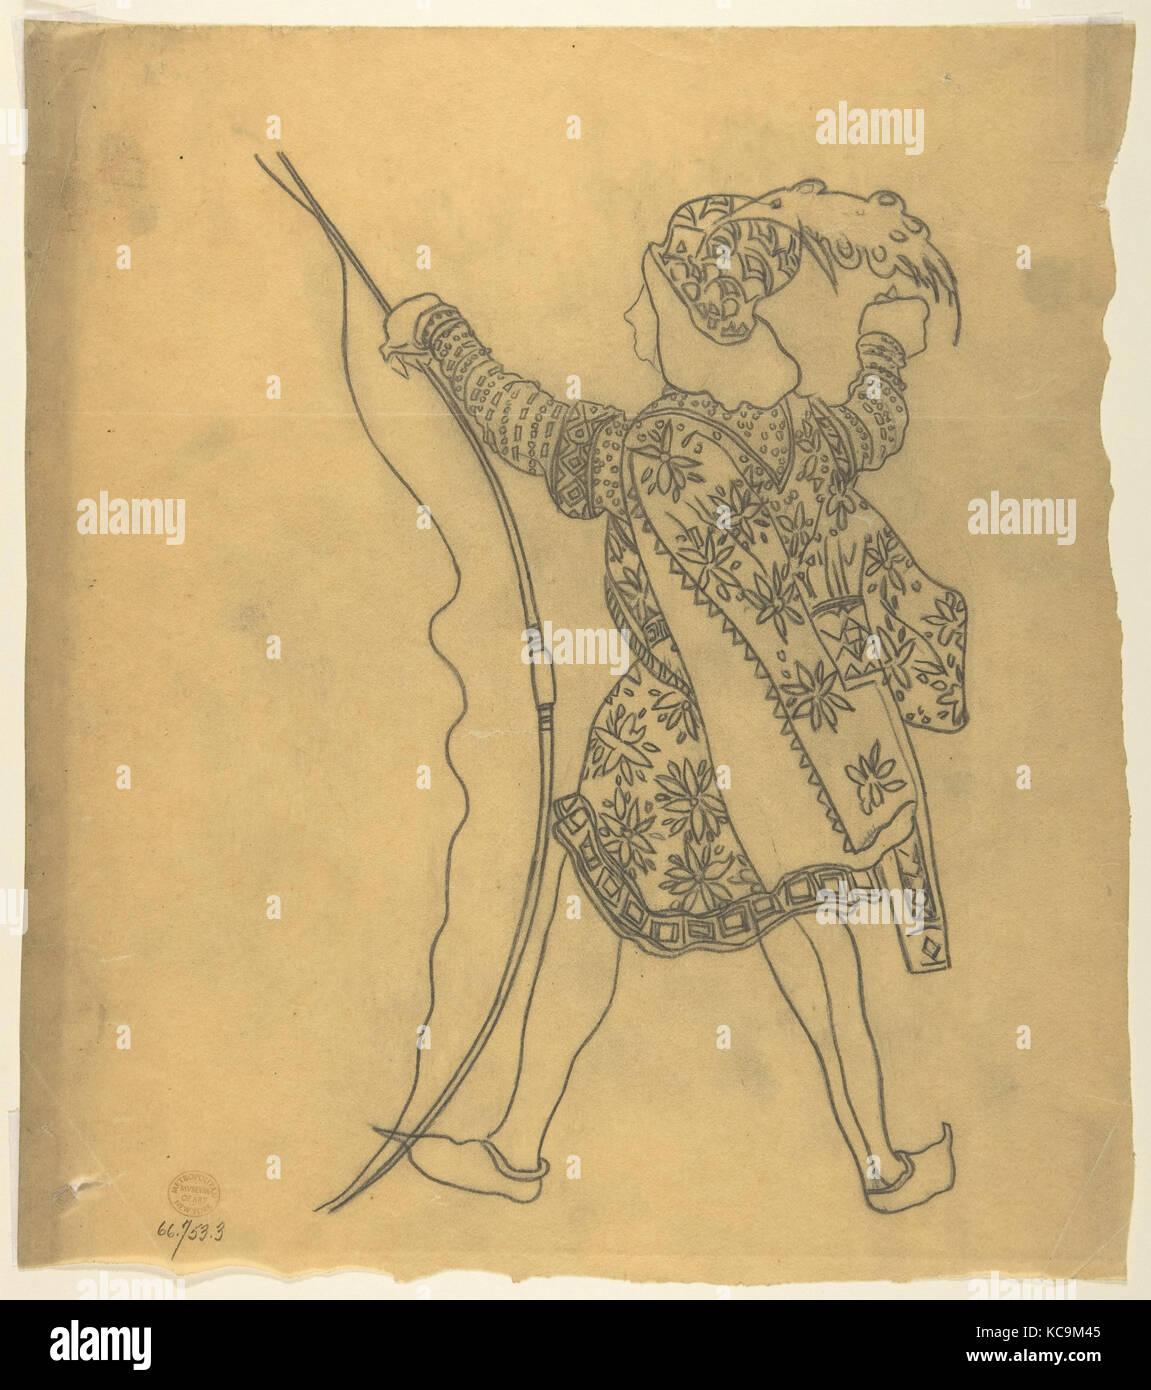 Tracing of a Ballet Costume: St Sebastian, Léon Bakst, 1922 - Stock Image